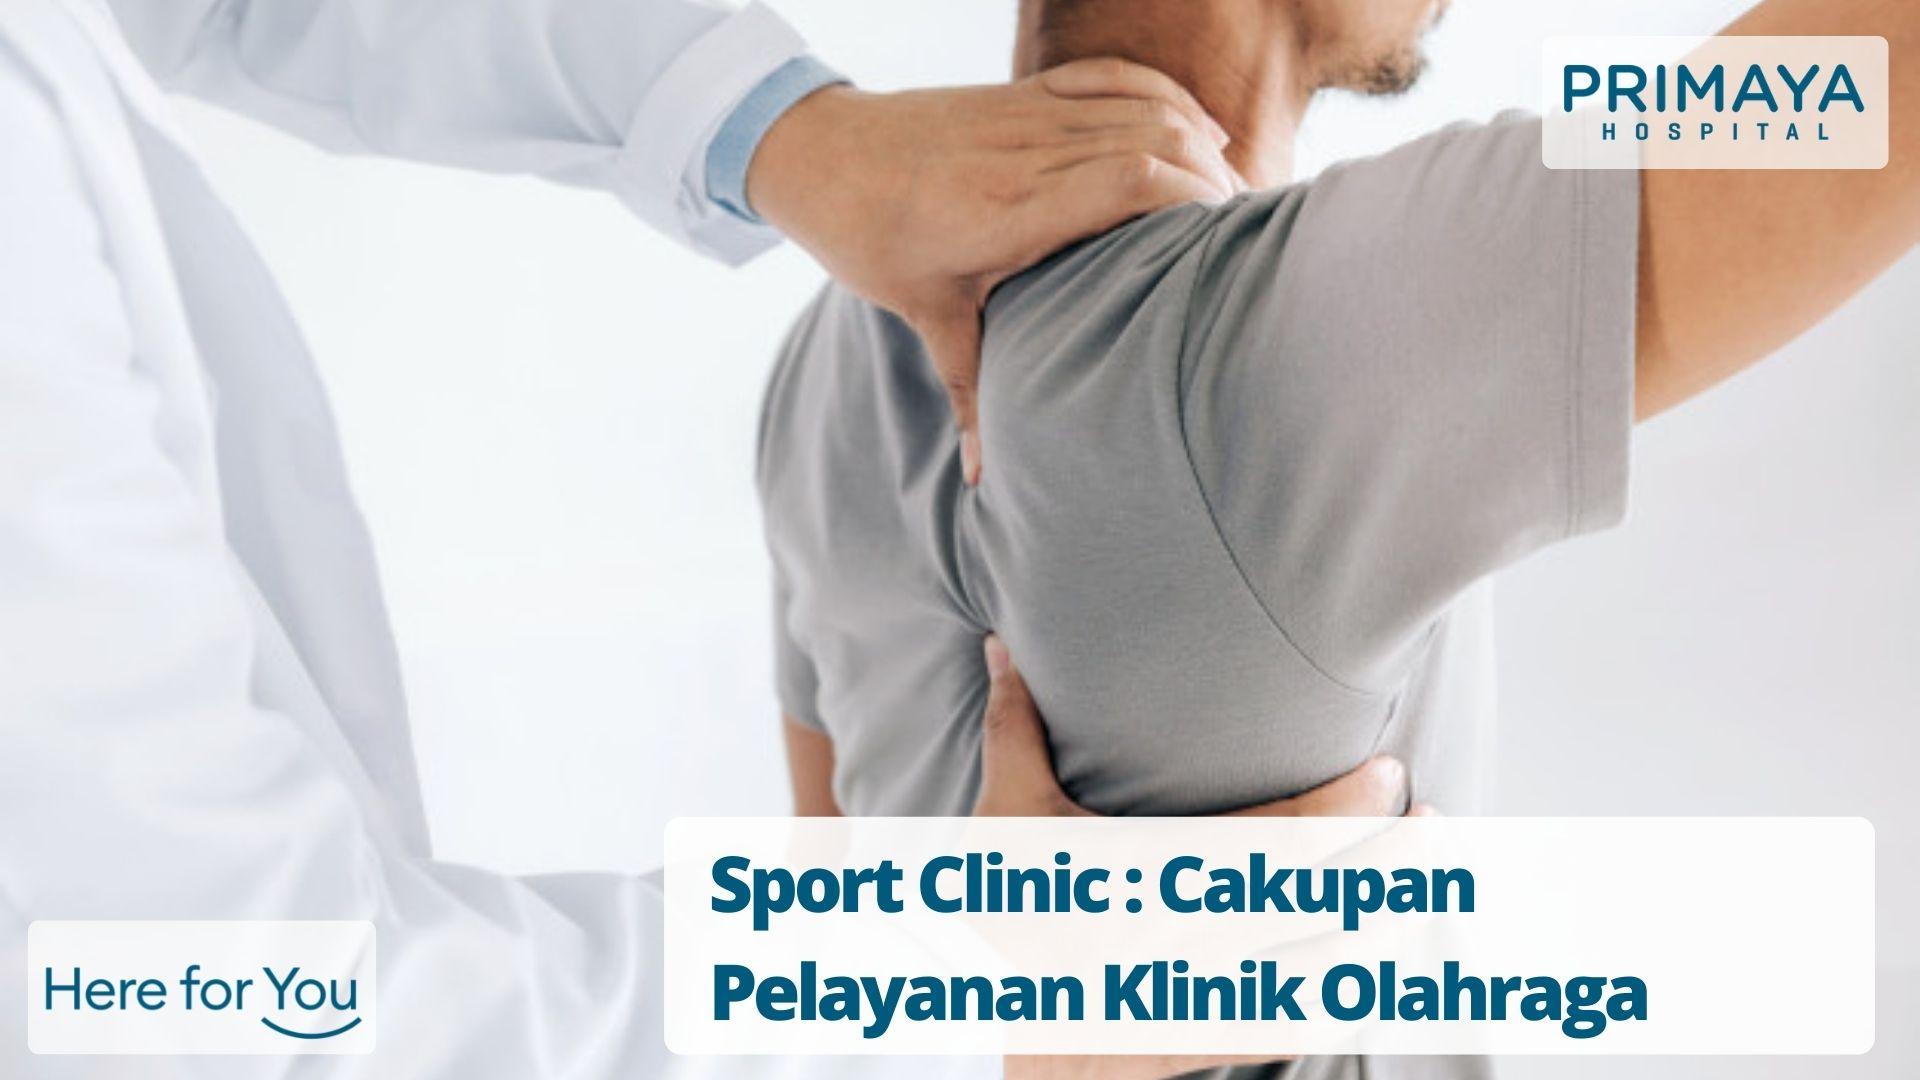 Sport Clinic Cakupan Pelayanan Klinik Olahraga